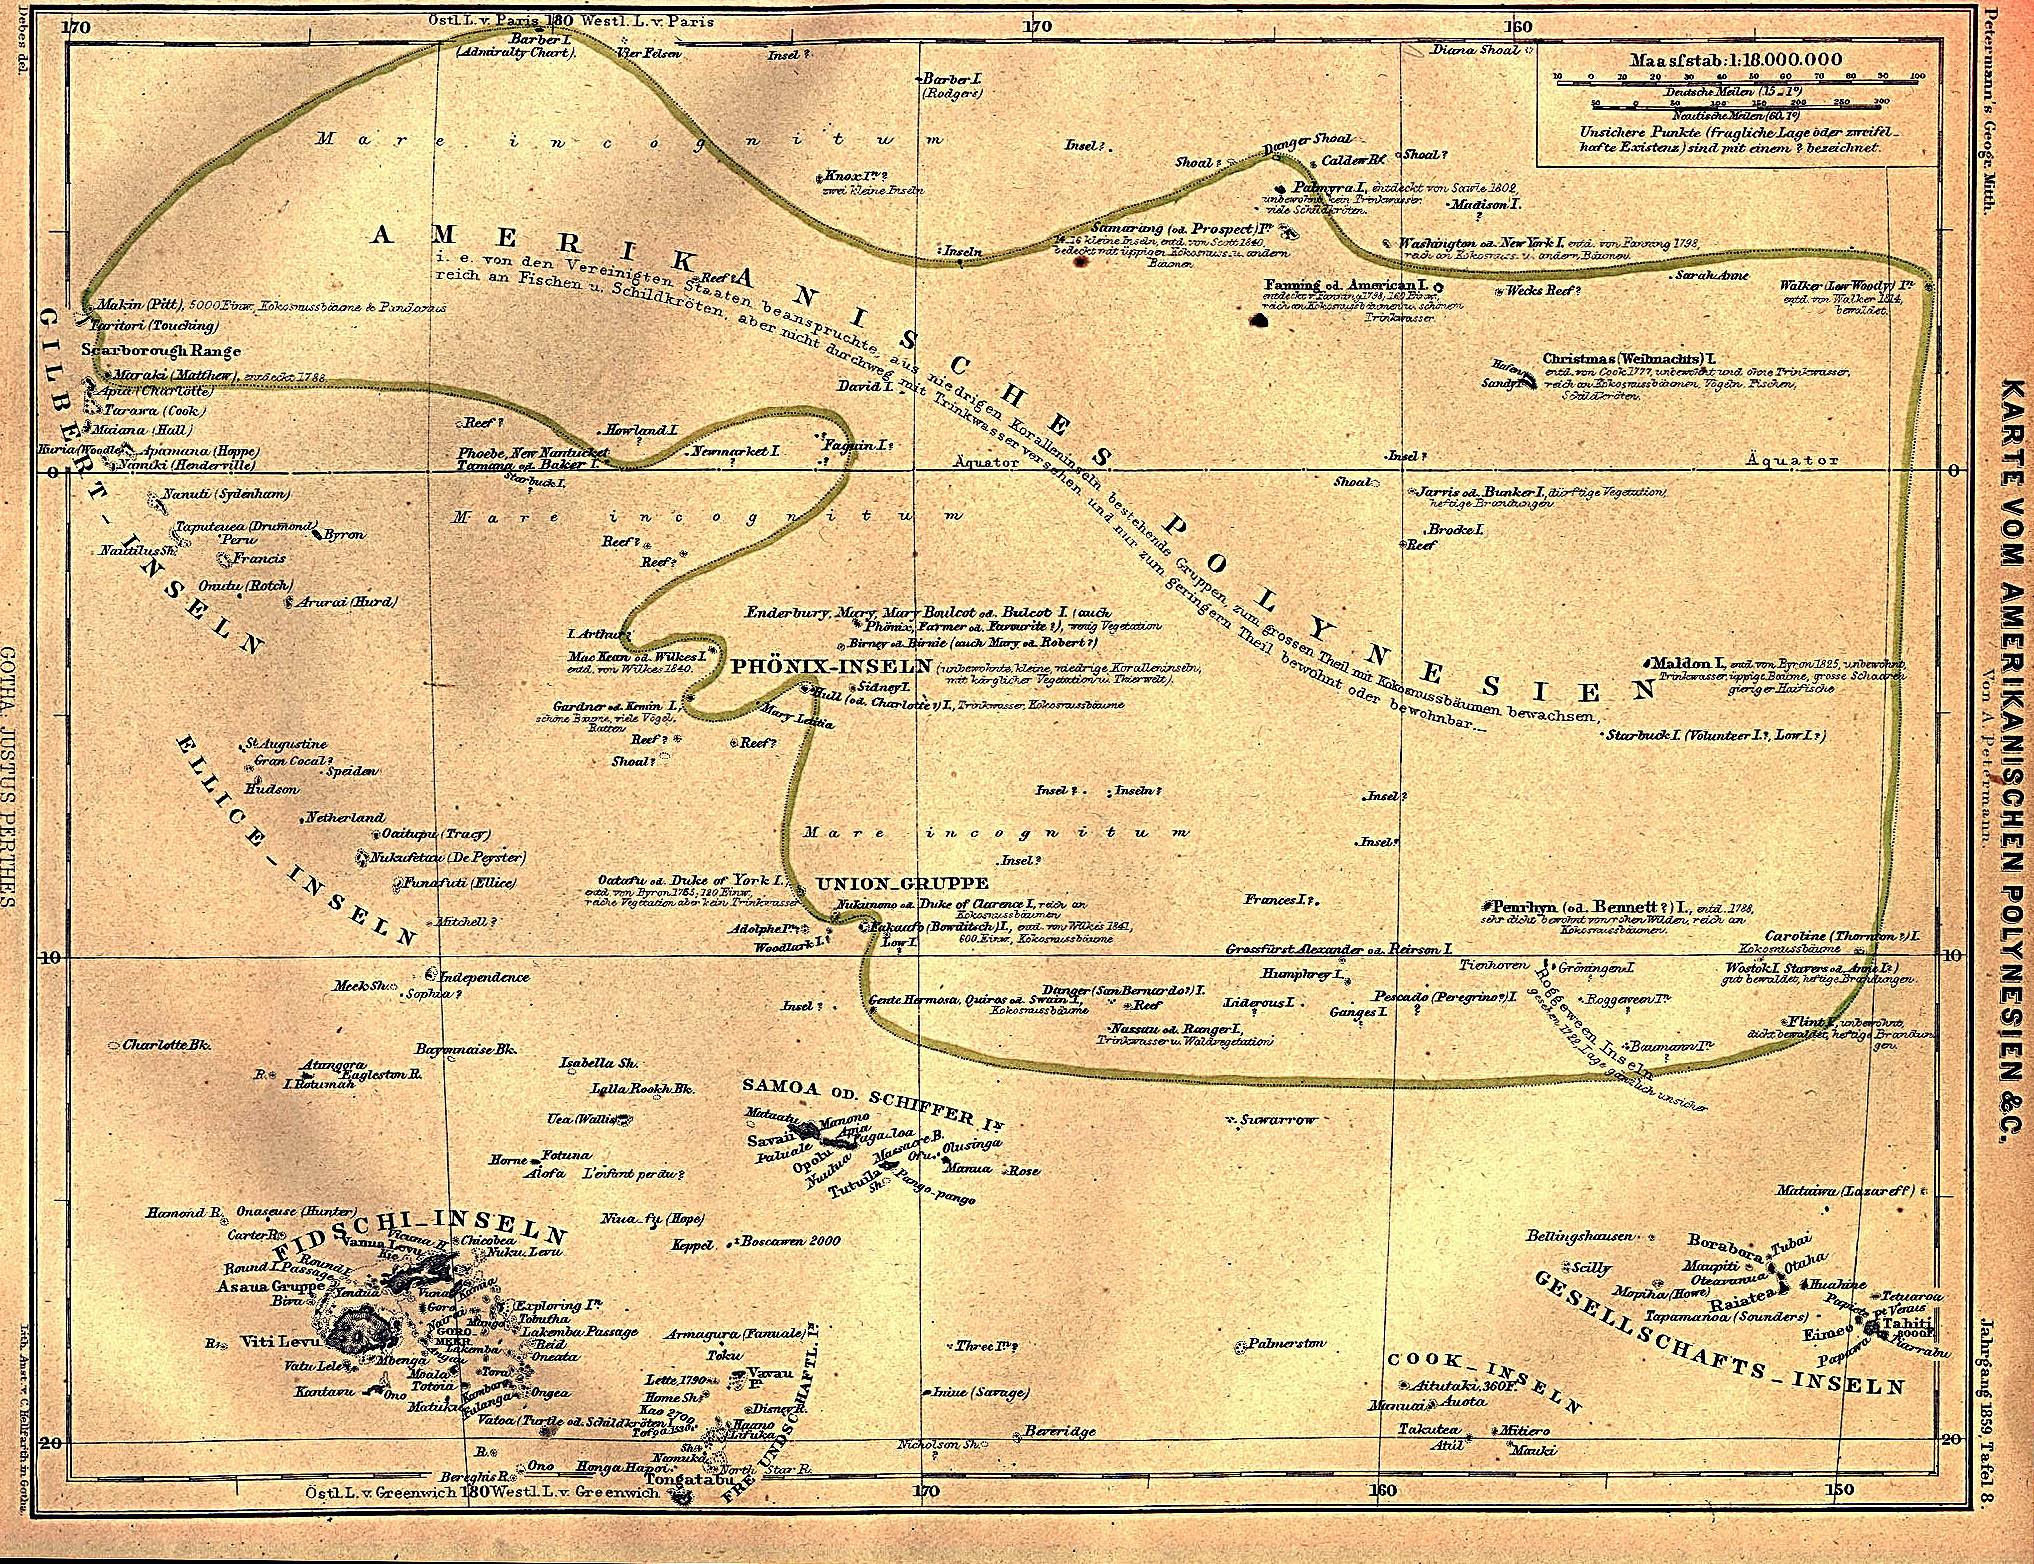 amerikanischen polynesien american polynesia 1859